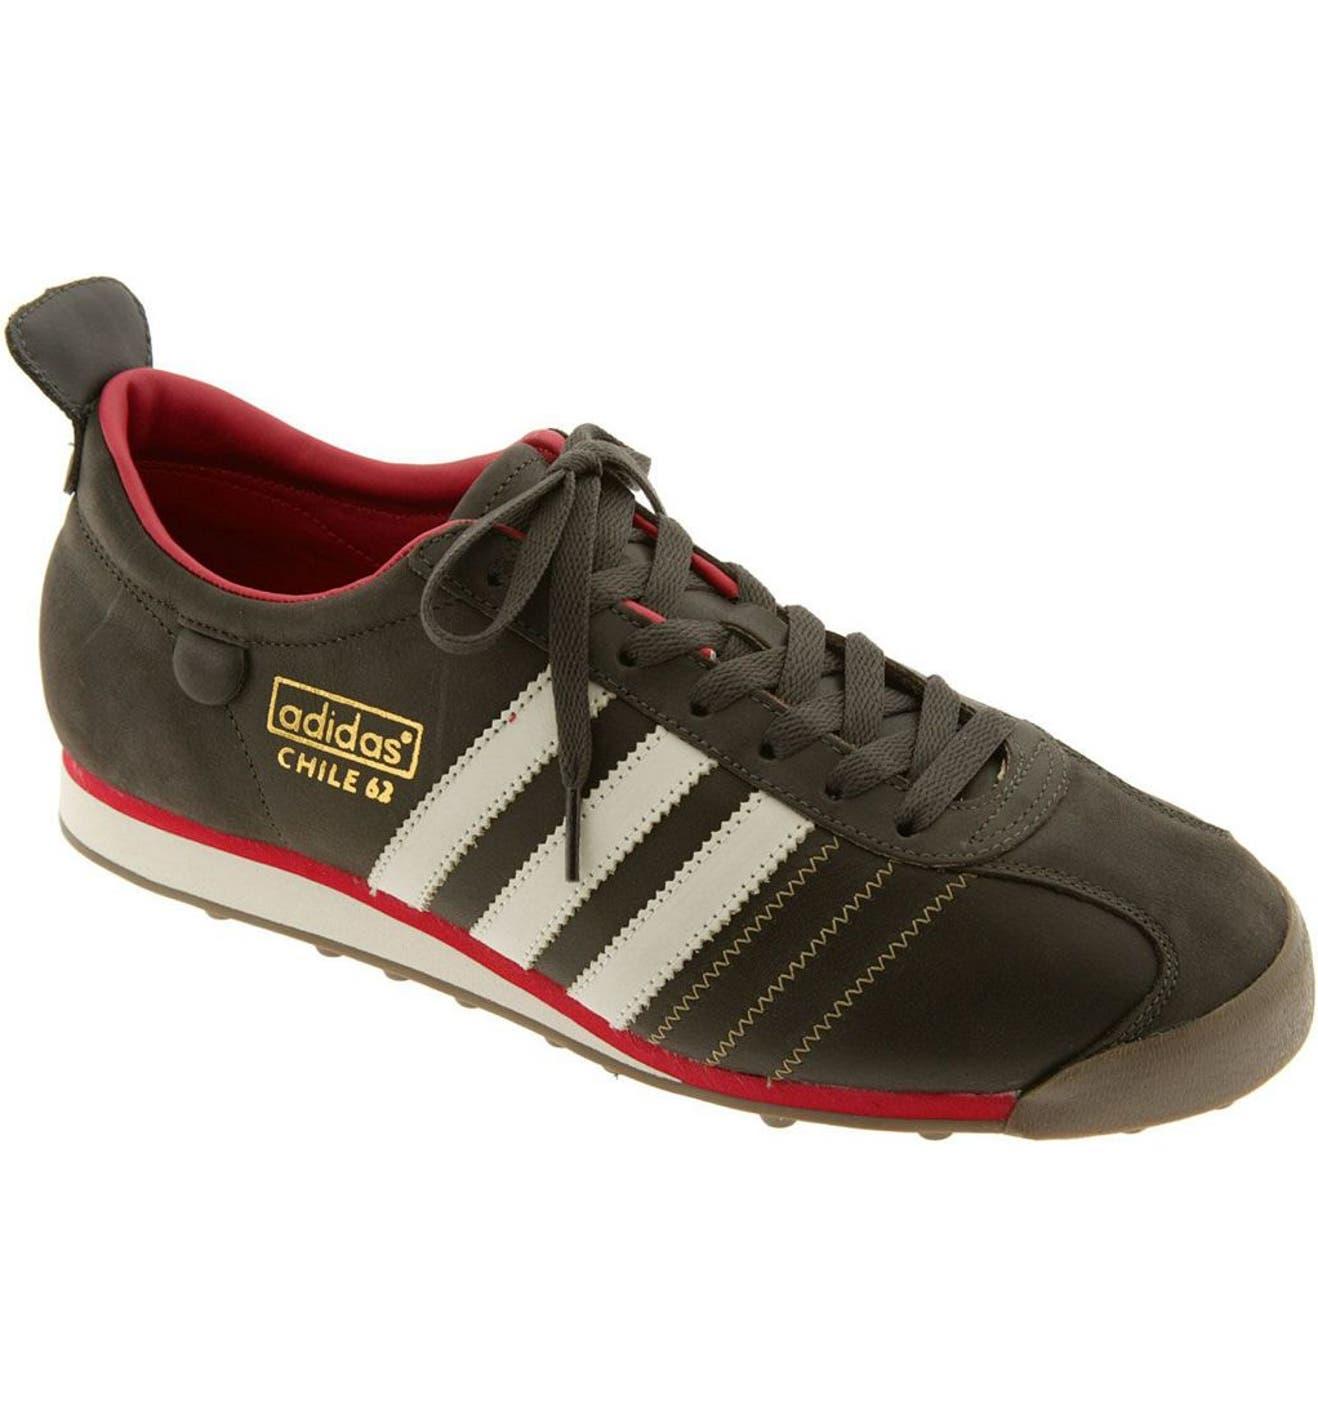 Soccer Adidas 62' ShoemenNordstrom 'chile ShoemenNordstrom Adidas Adidas 62' Soccer 'chile vm8N0wn